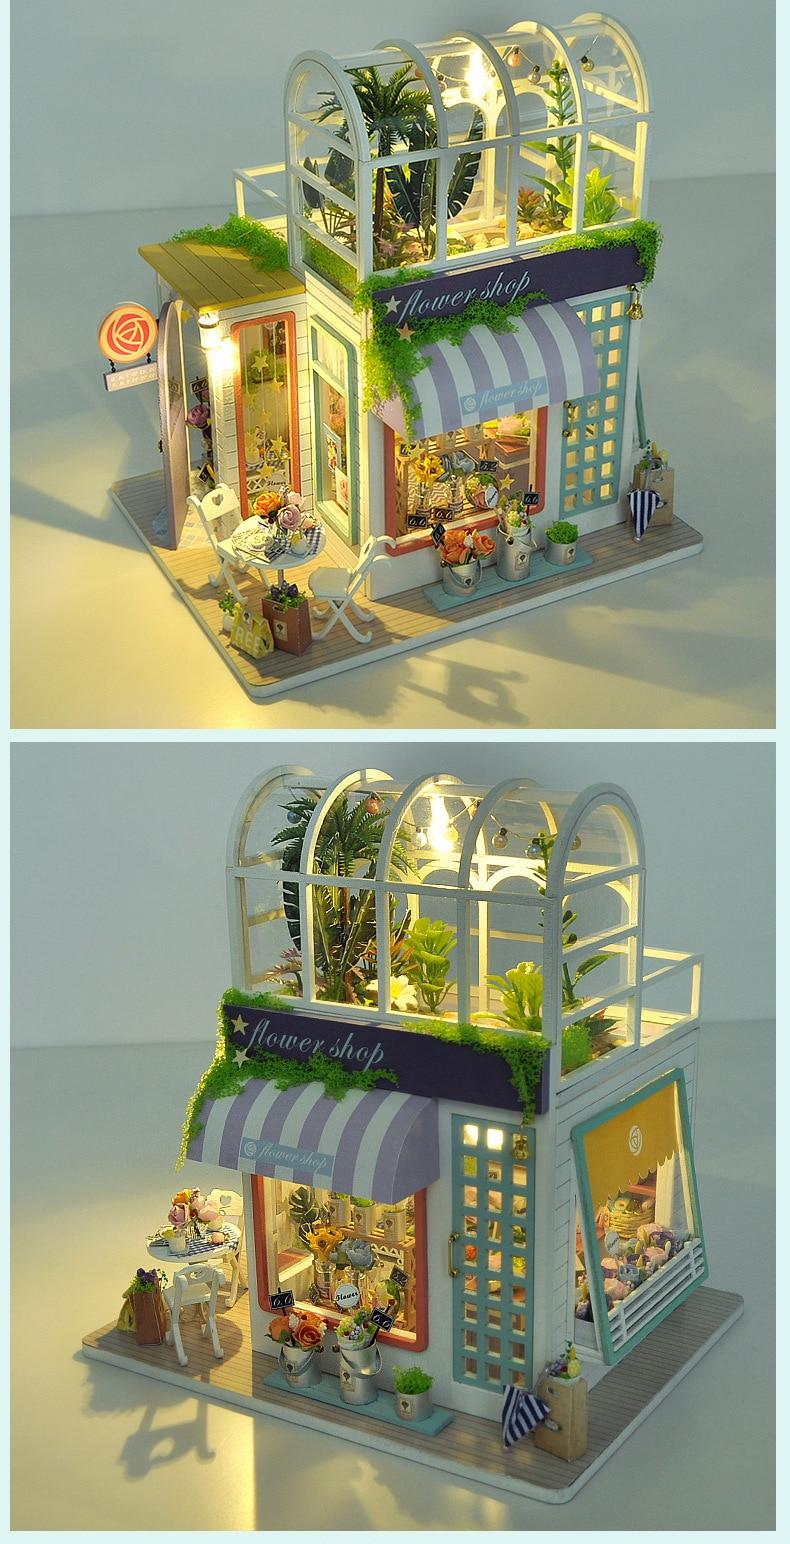 Hae84c048cdd649e89d31430ade0d2749J - Robotime - DIY Models, DIY Miniature Houses, 3d Wooden Puzzle